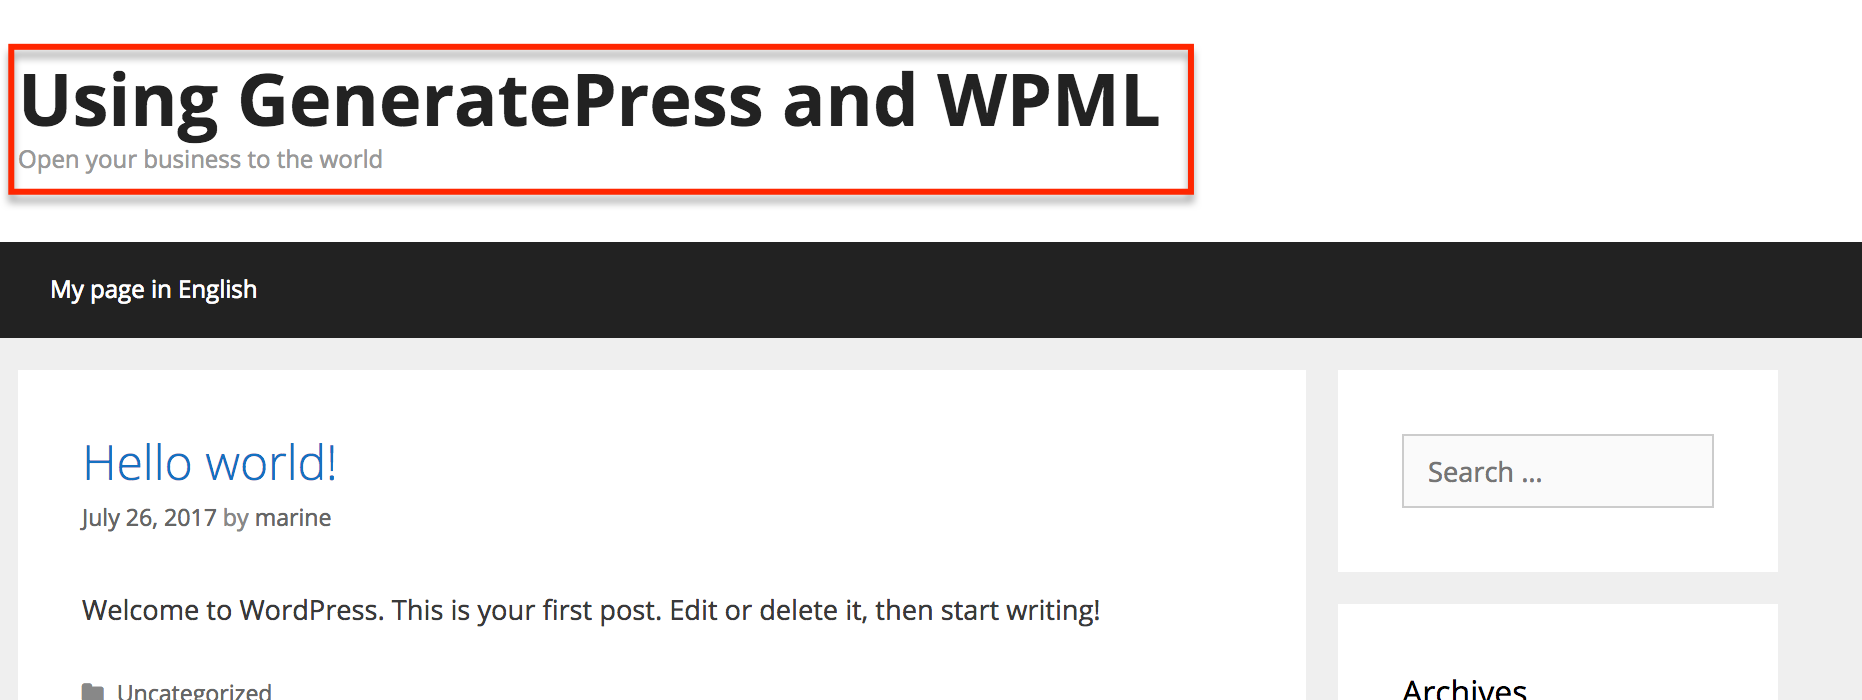 WPML and GeneratePress